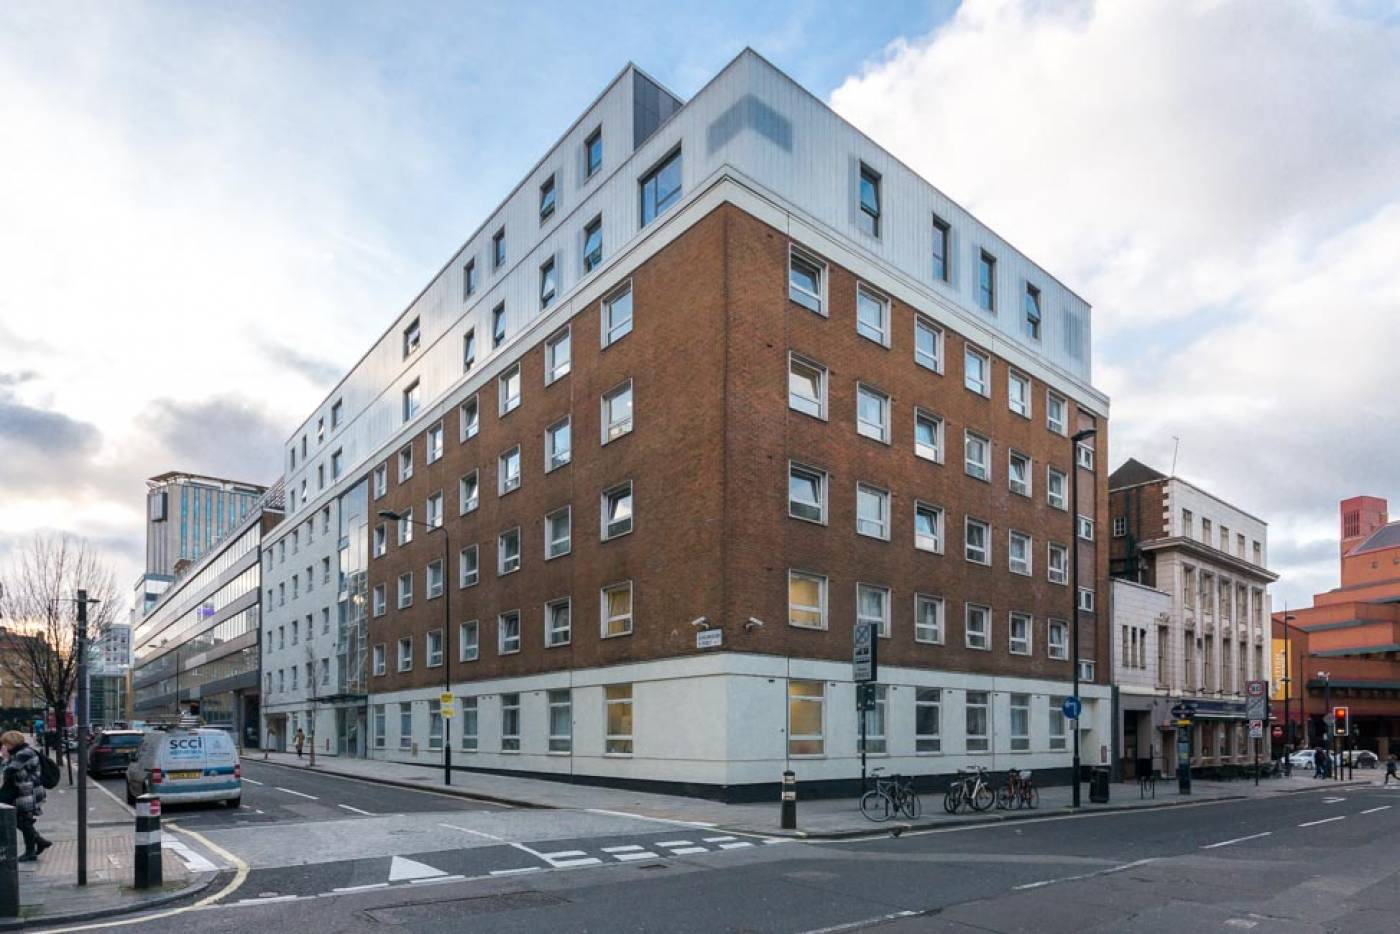 john dodgson house ucl accommodation ucl londons global university